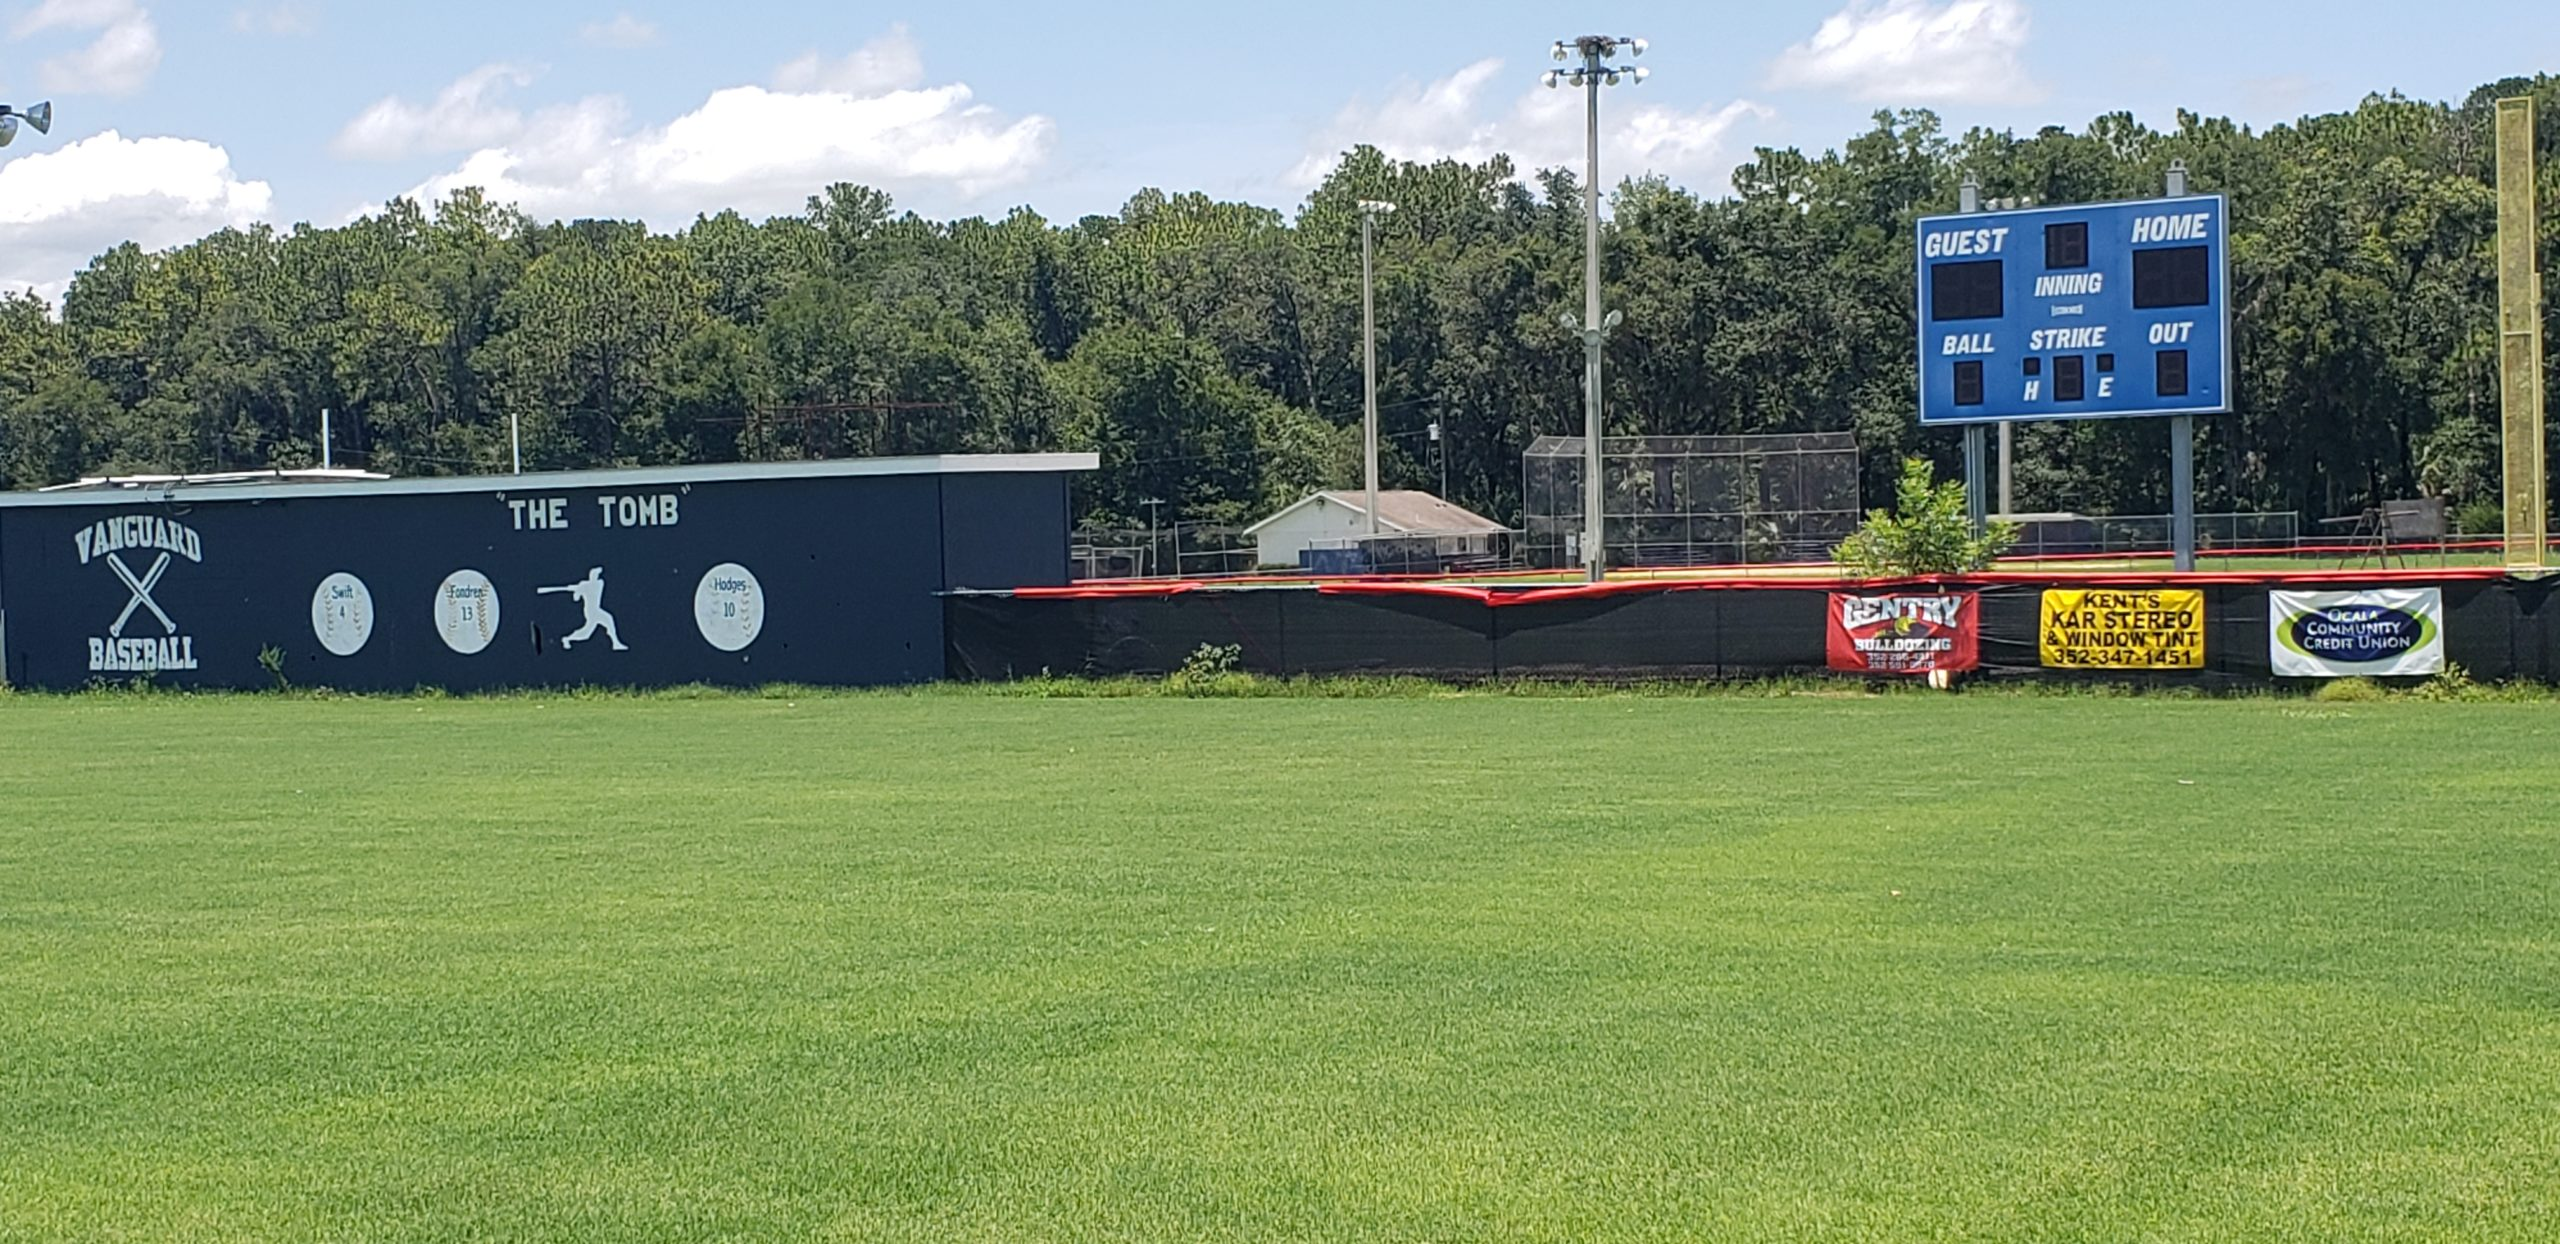 OCCU Sponsors Vanguard Baseball1